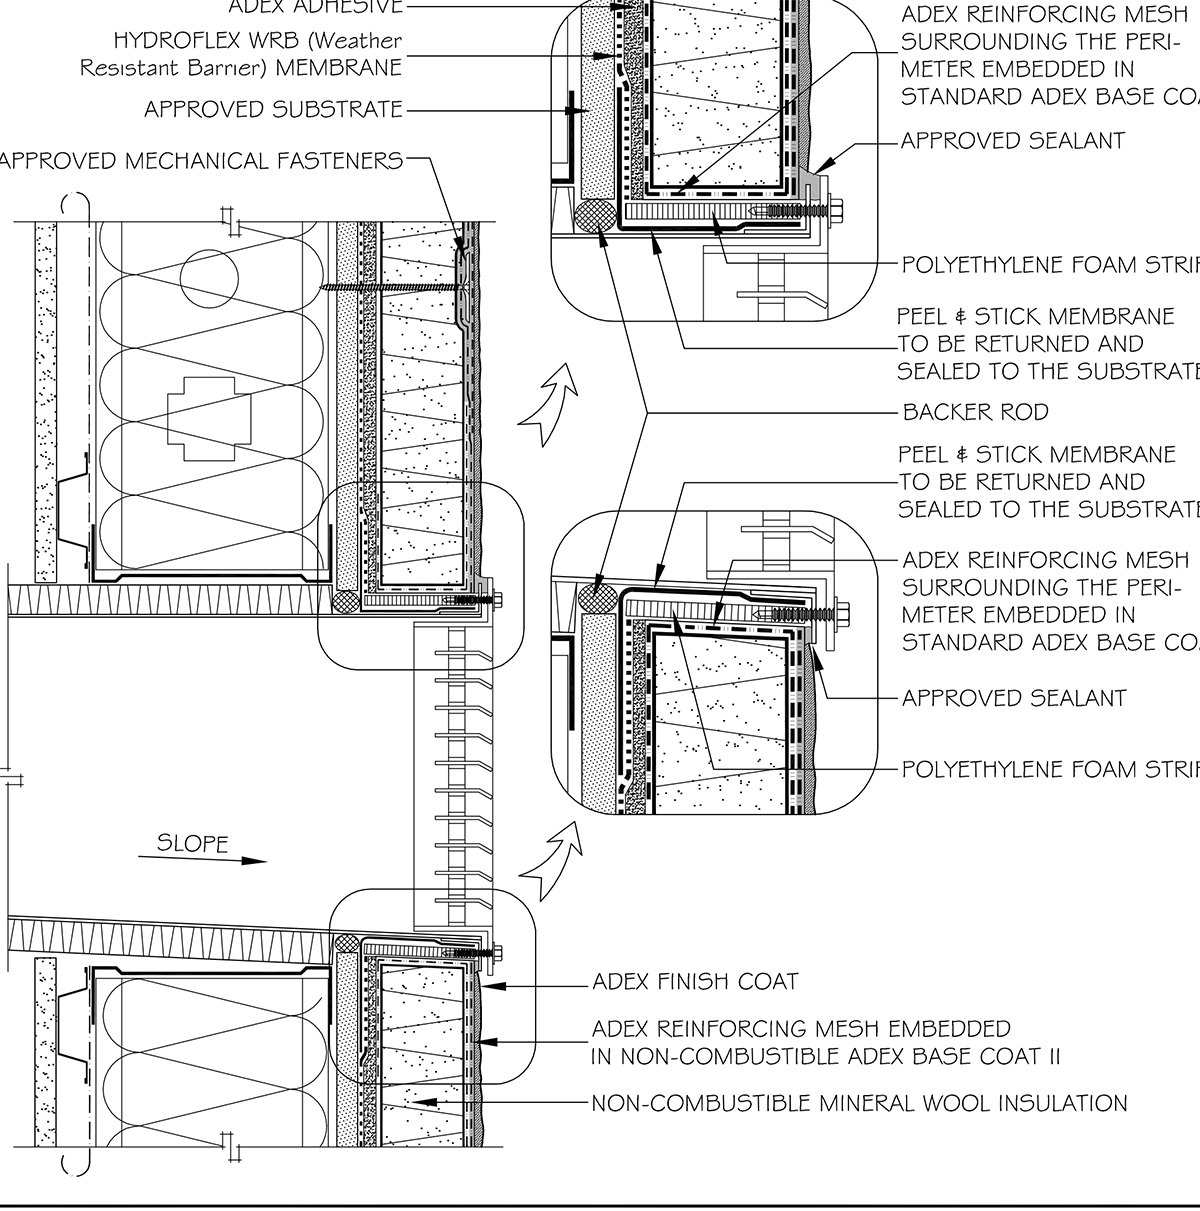 Xnc Insulation Sytem Adex Architectural Coatings